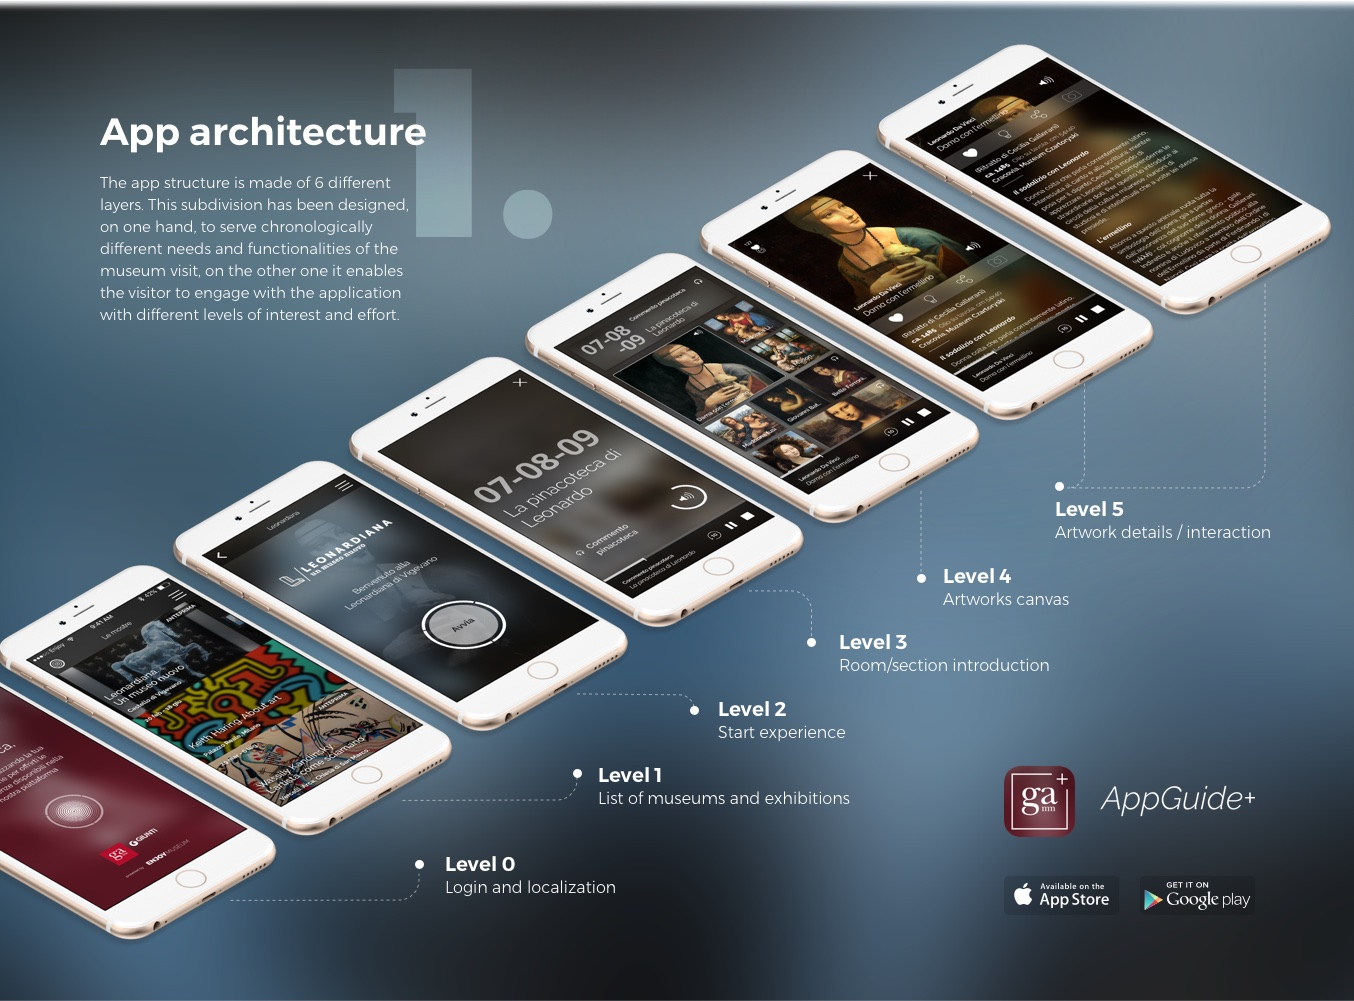 AppGuide+ Leonardiana Museum Experience - Architecture